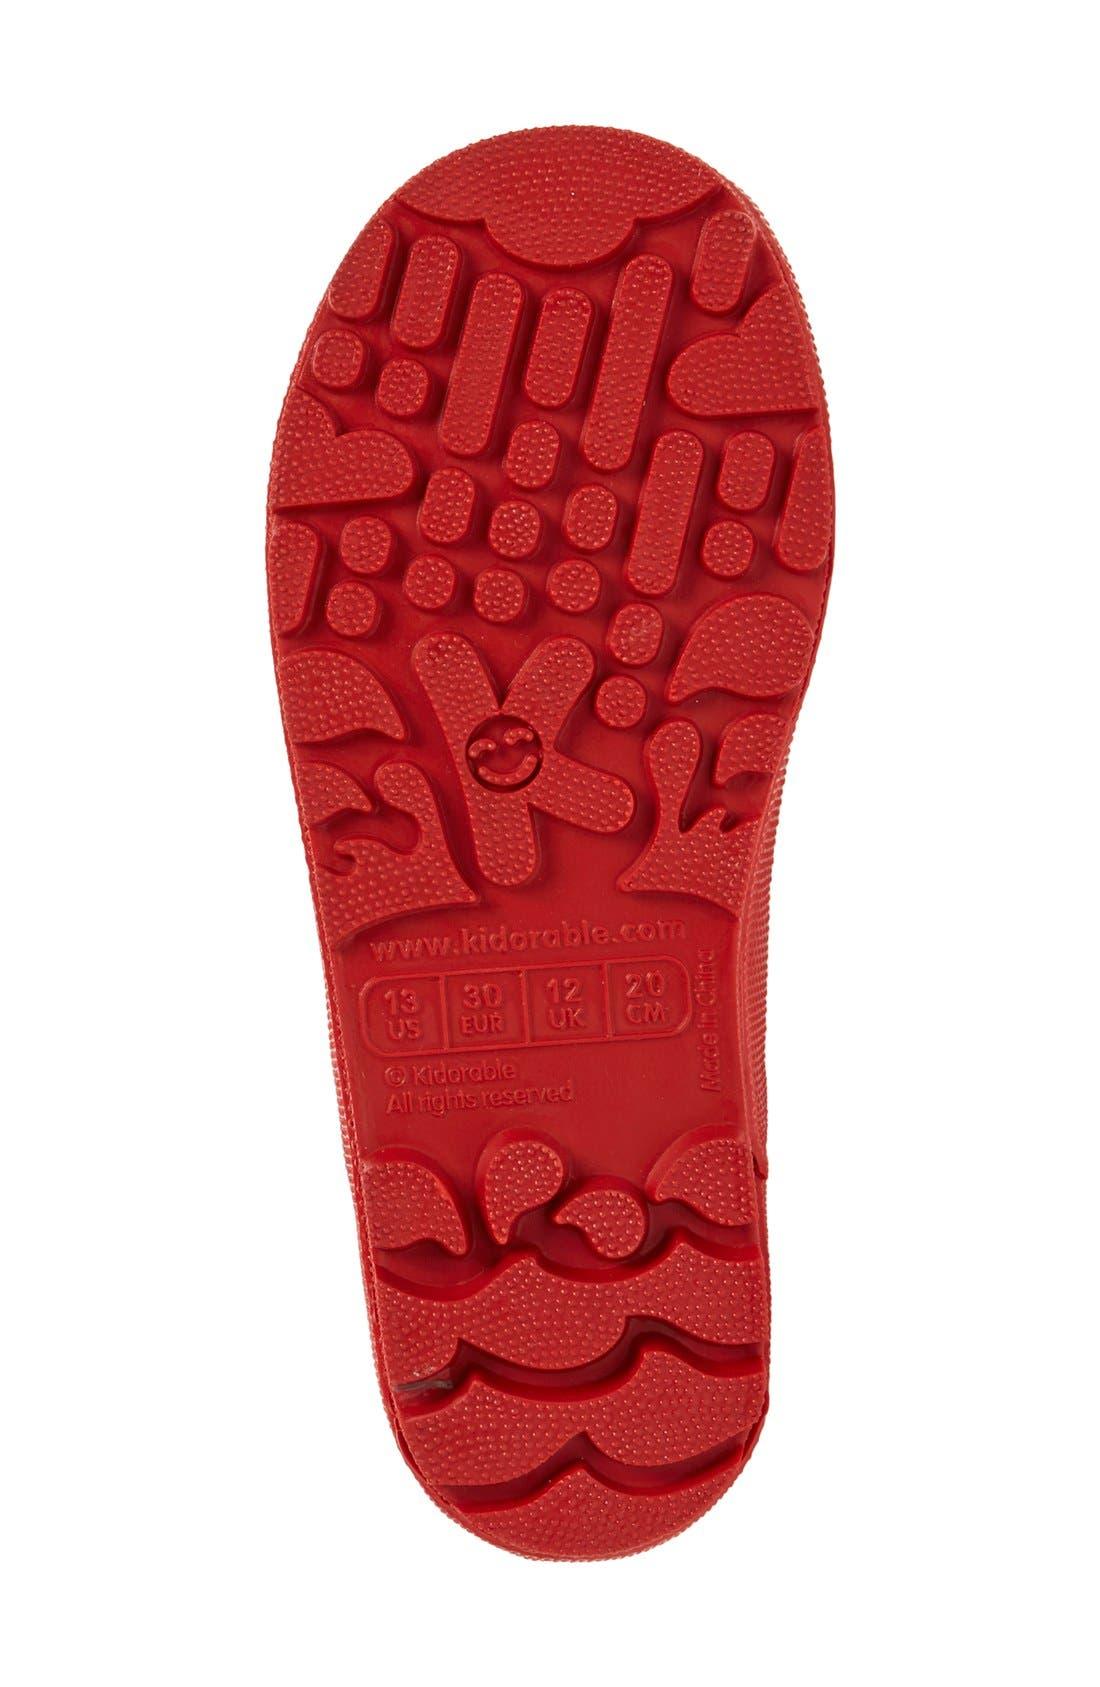 'Ladybug' Waterproof Rain Boot,                             Alternate thumbnail 4, color,                             Red